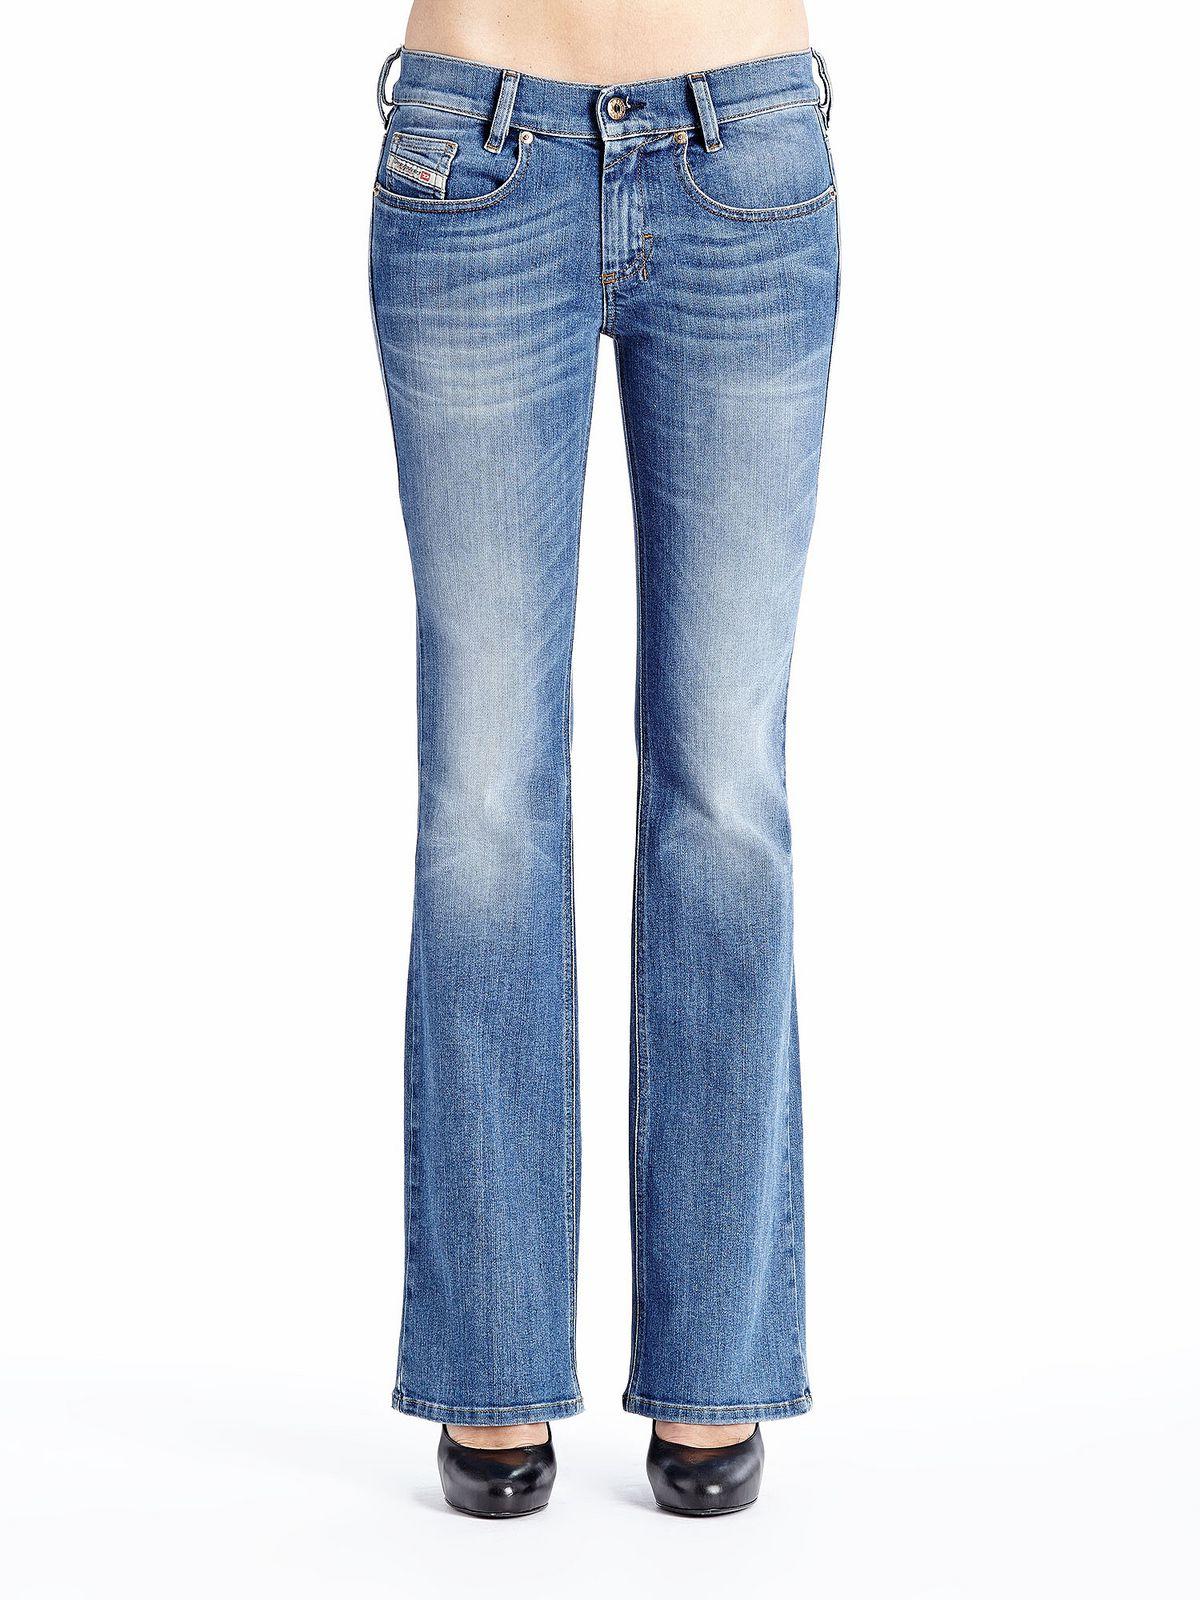 Diesel louvboot jeans bootcut 0830e